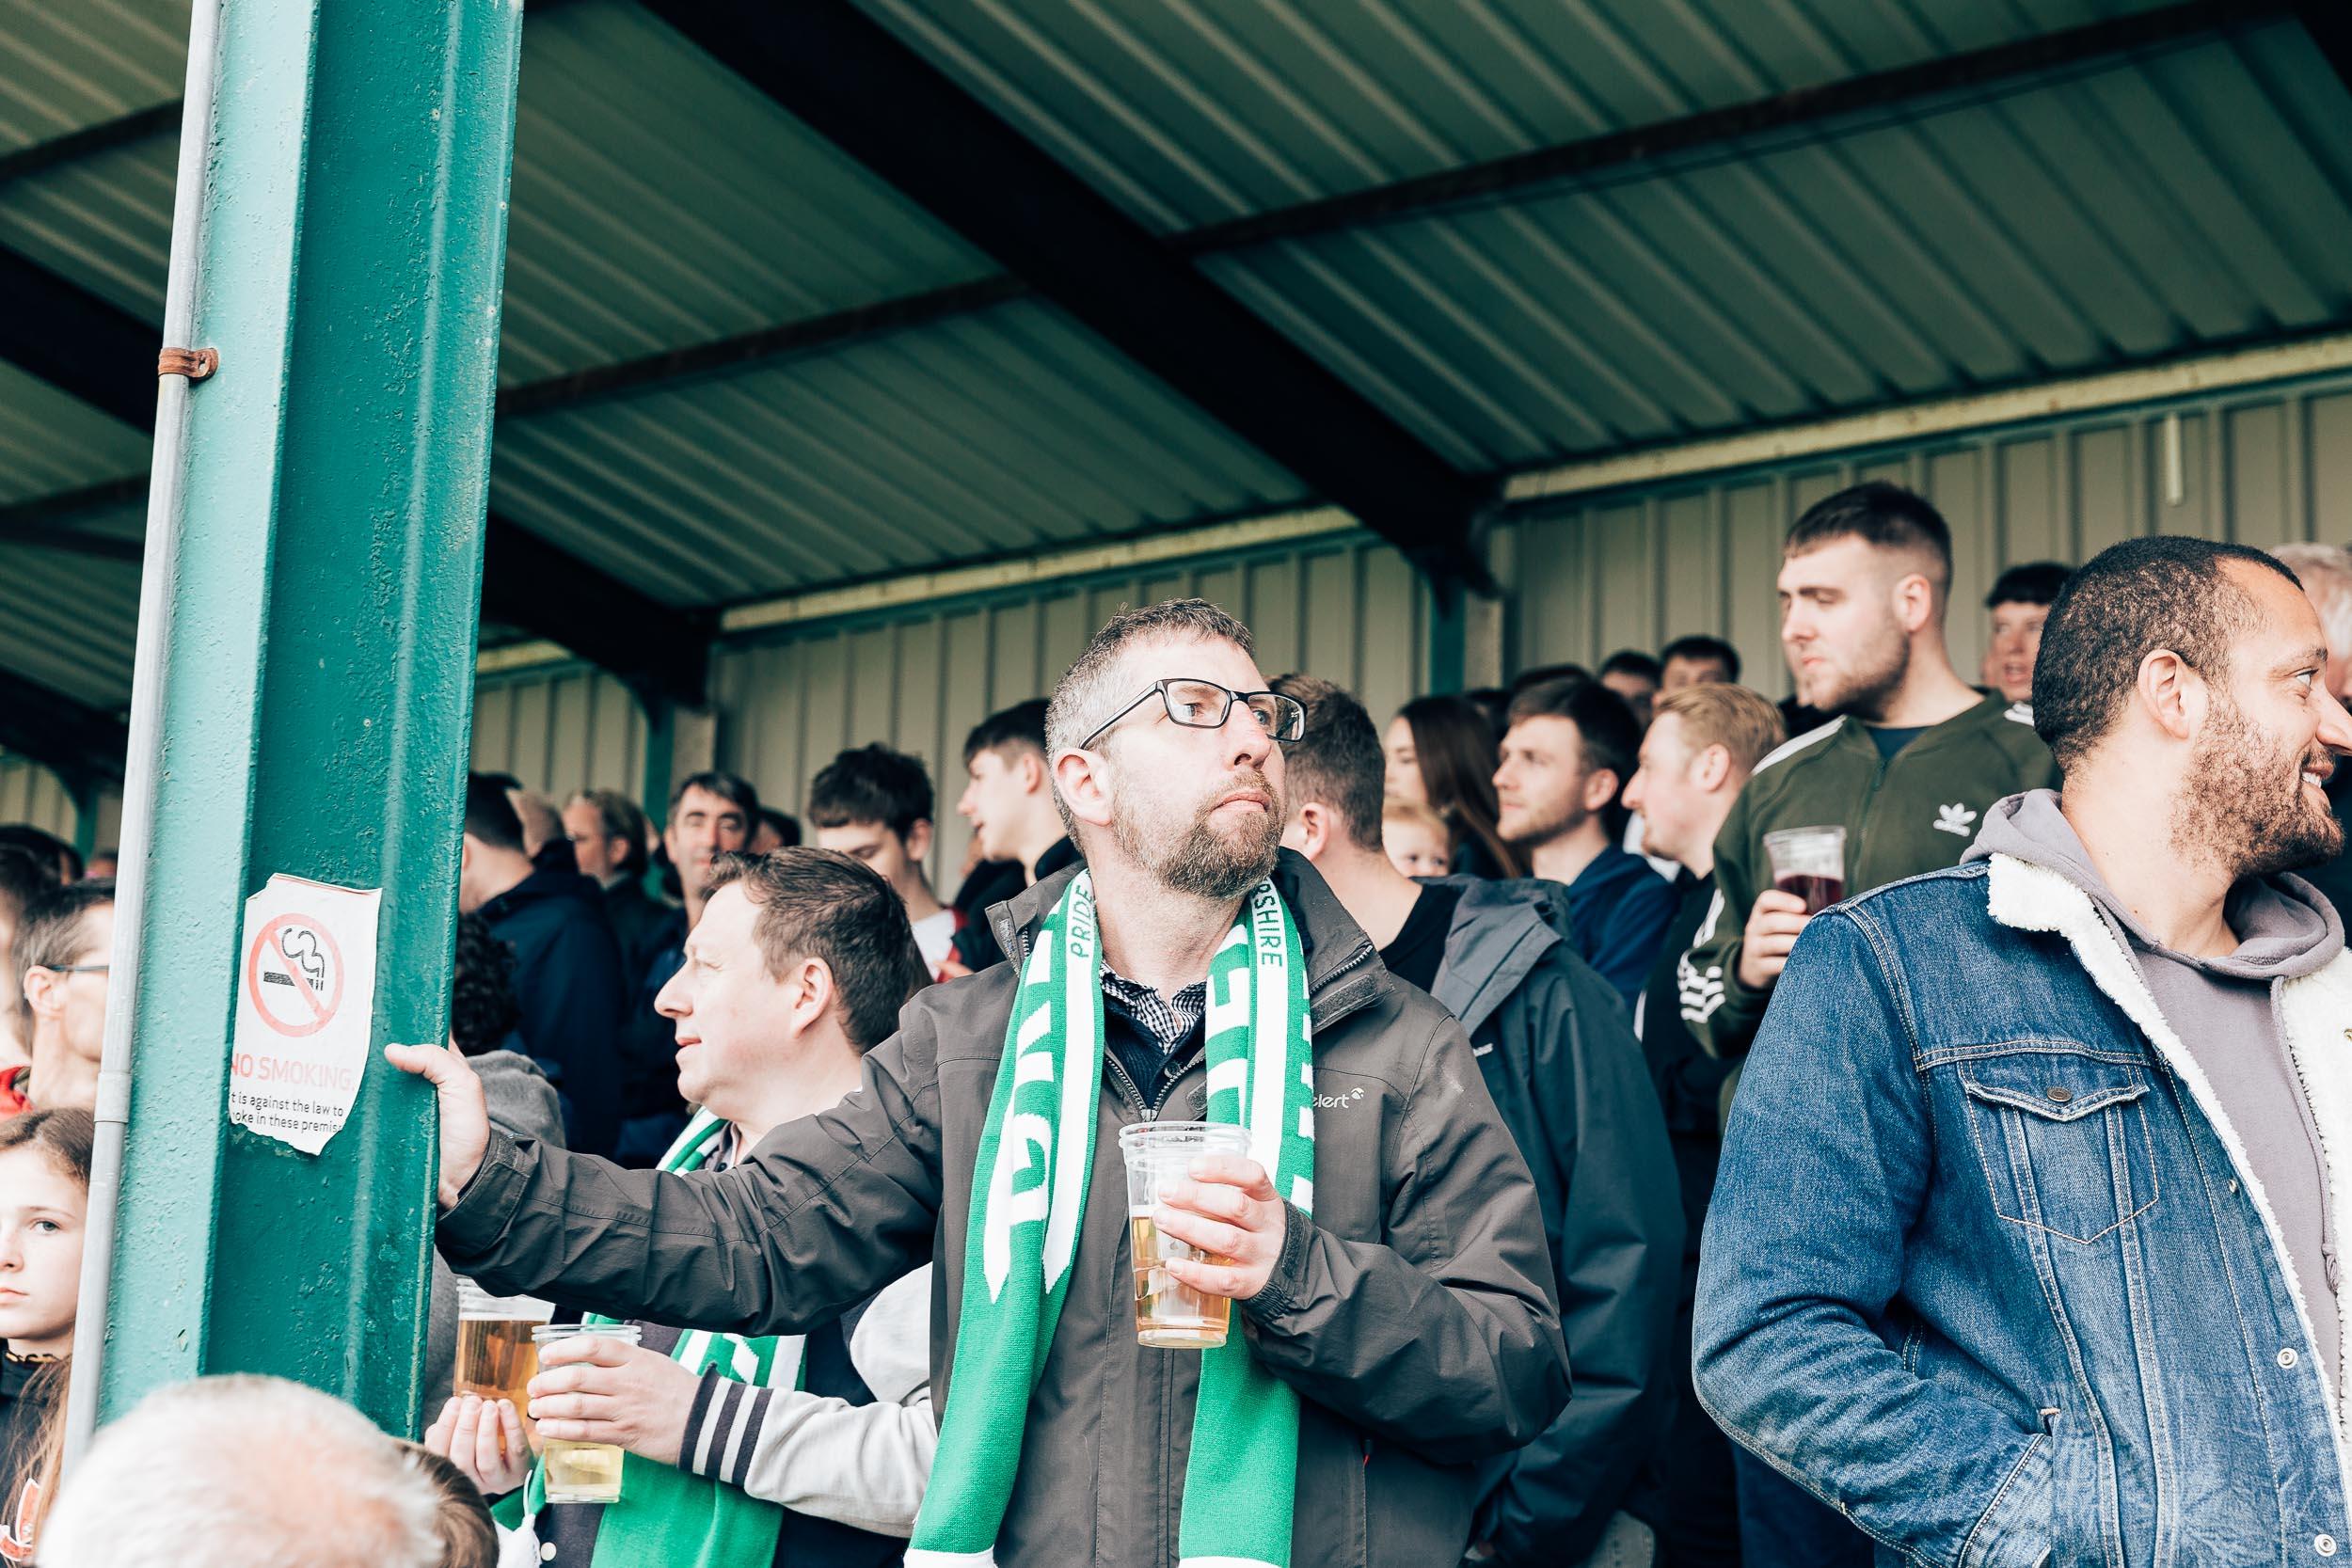 06_05_2019_Bromsgrove_Sporting_Corby-41.jpg